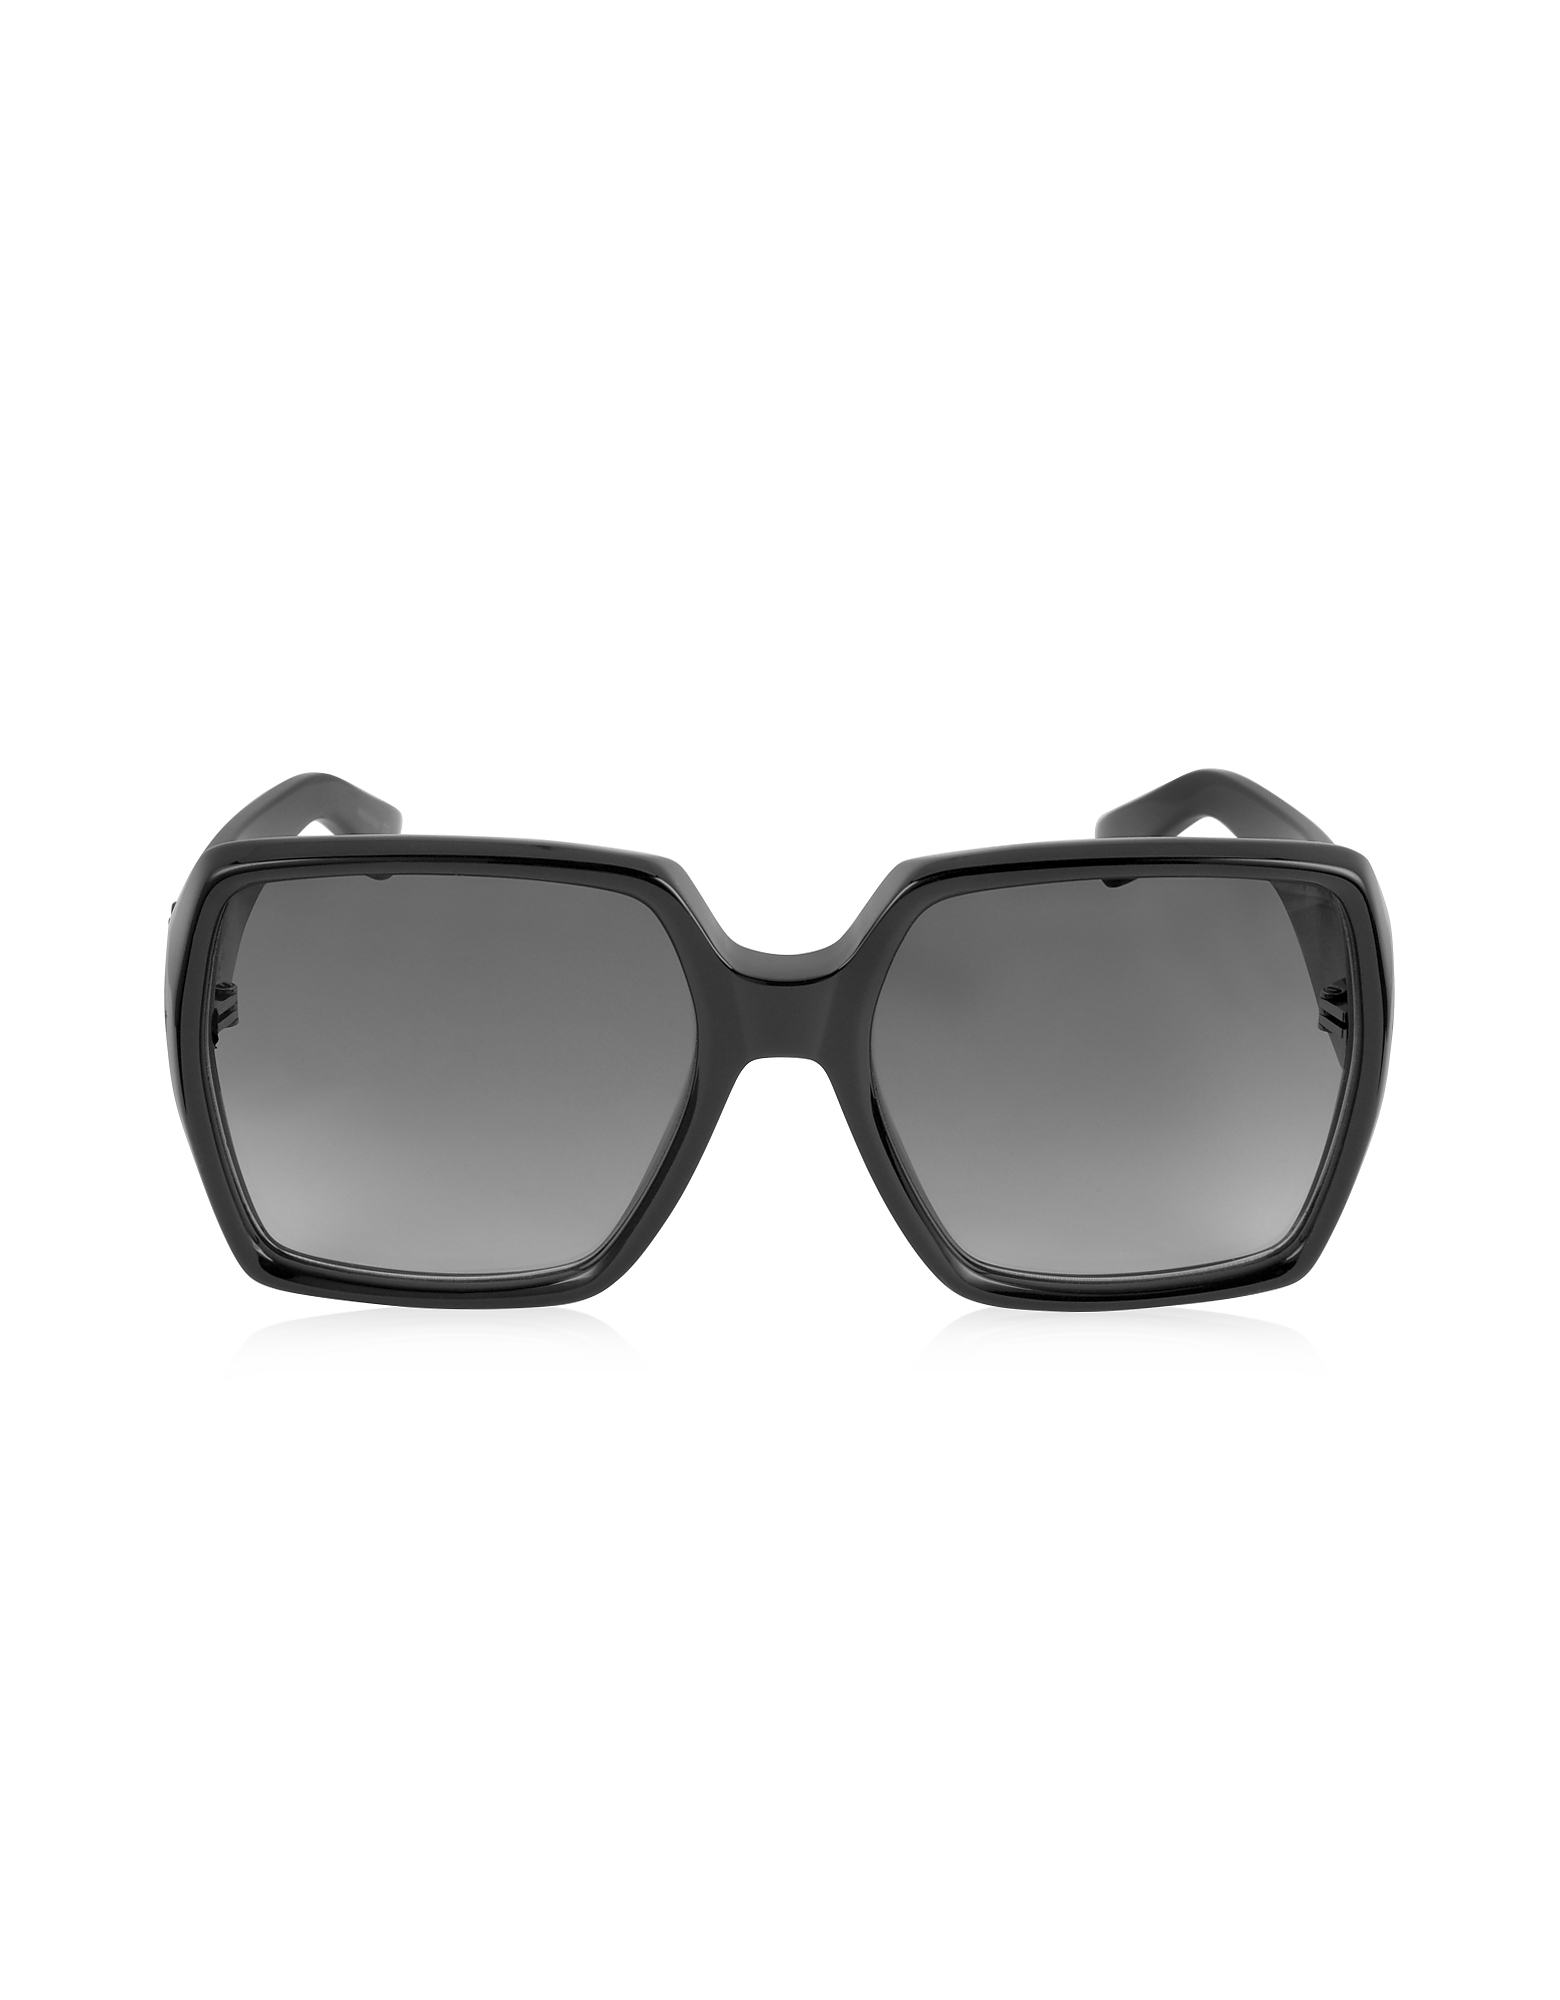 Saint Laurent Sunglasses, SL M2 Oversized Black Square-Frame Acetate Women's Sunglasses